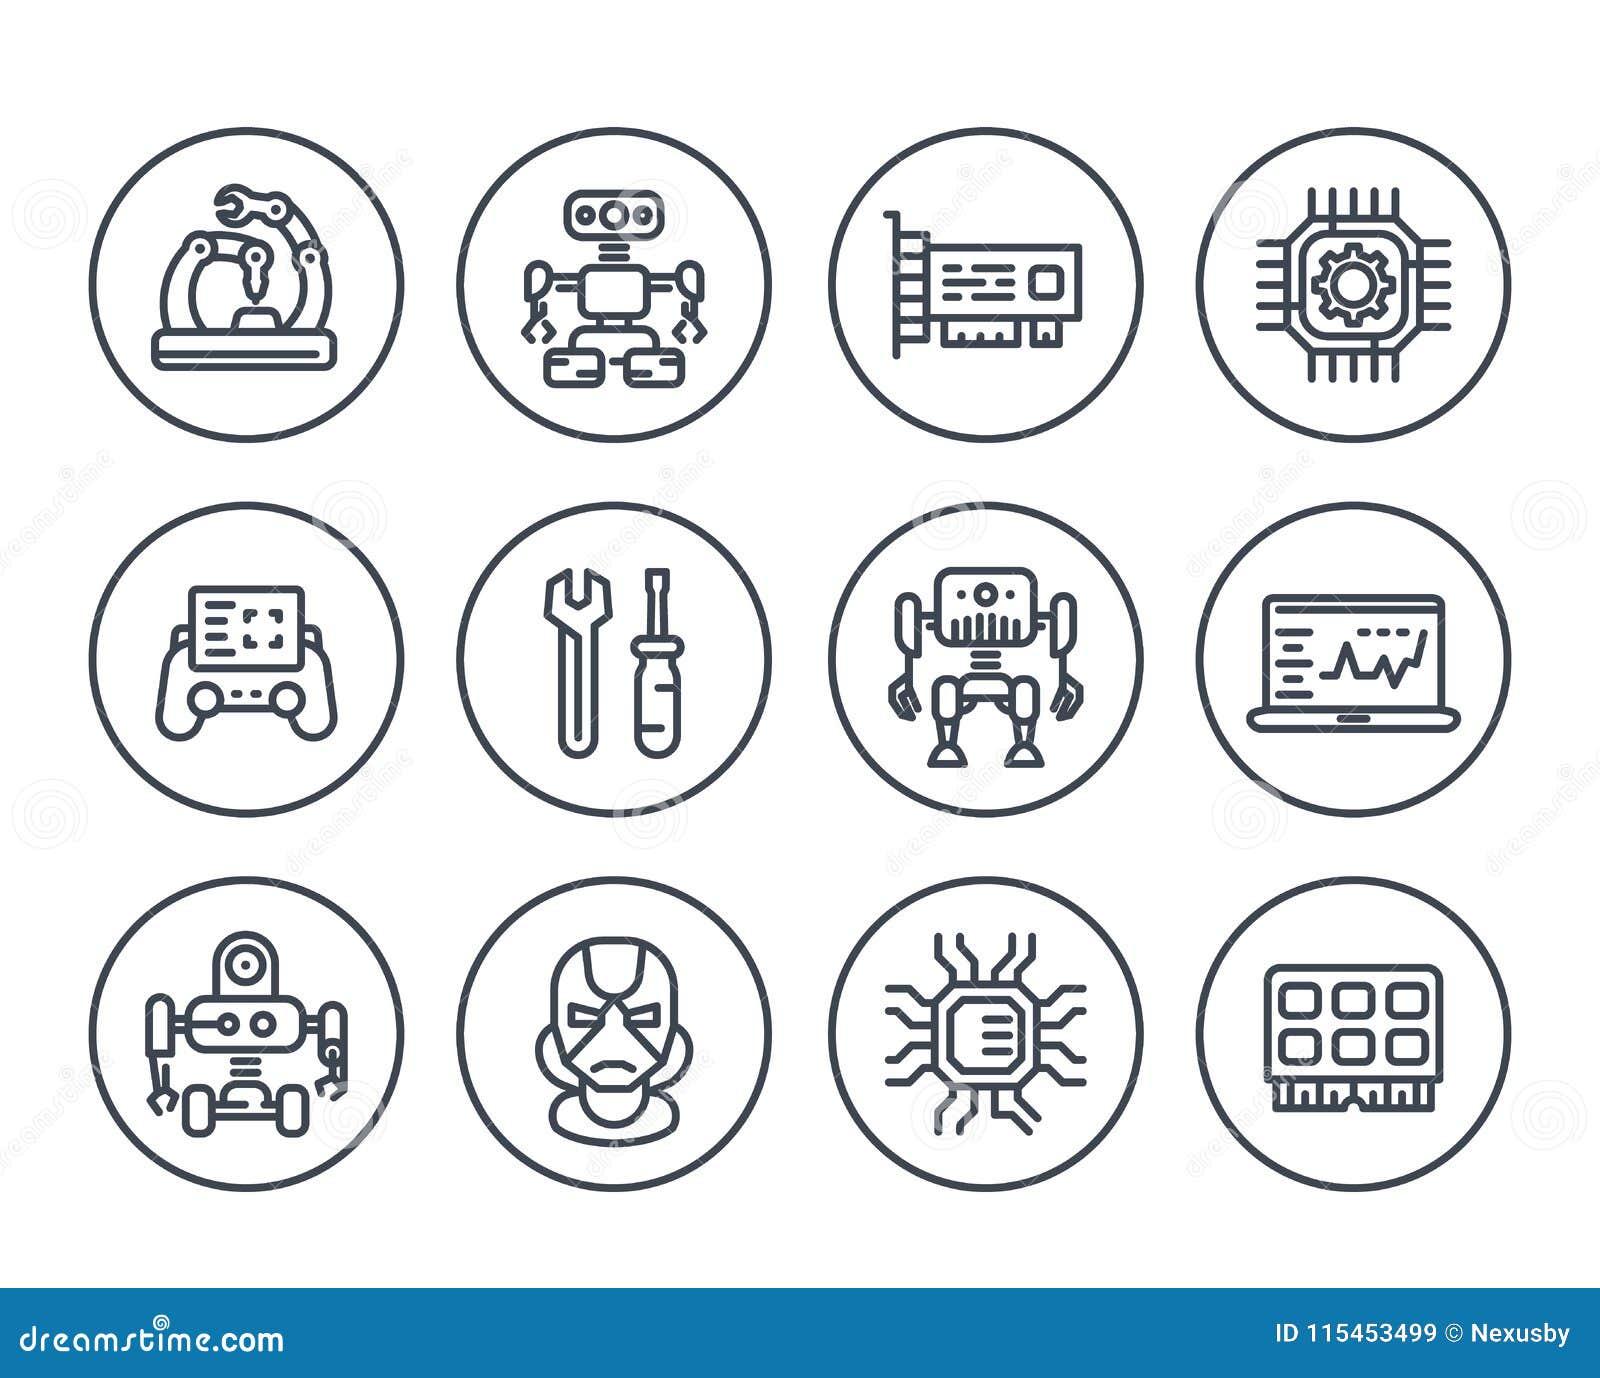 Robotics, mechanical engineering, robots, icons